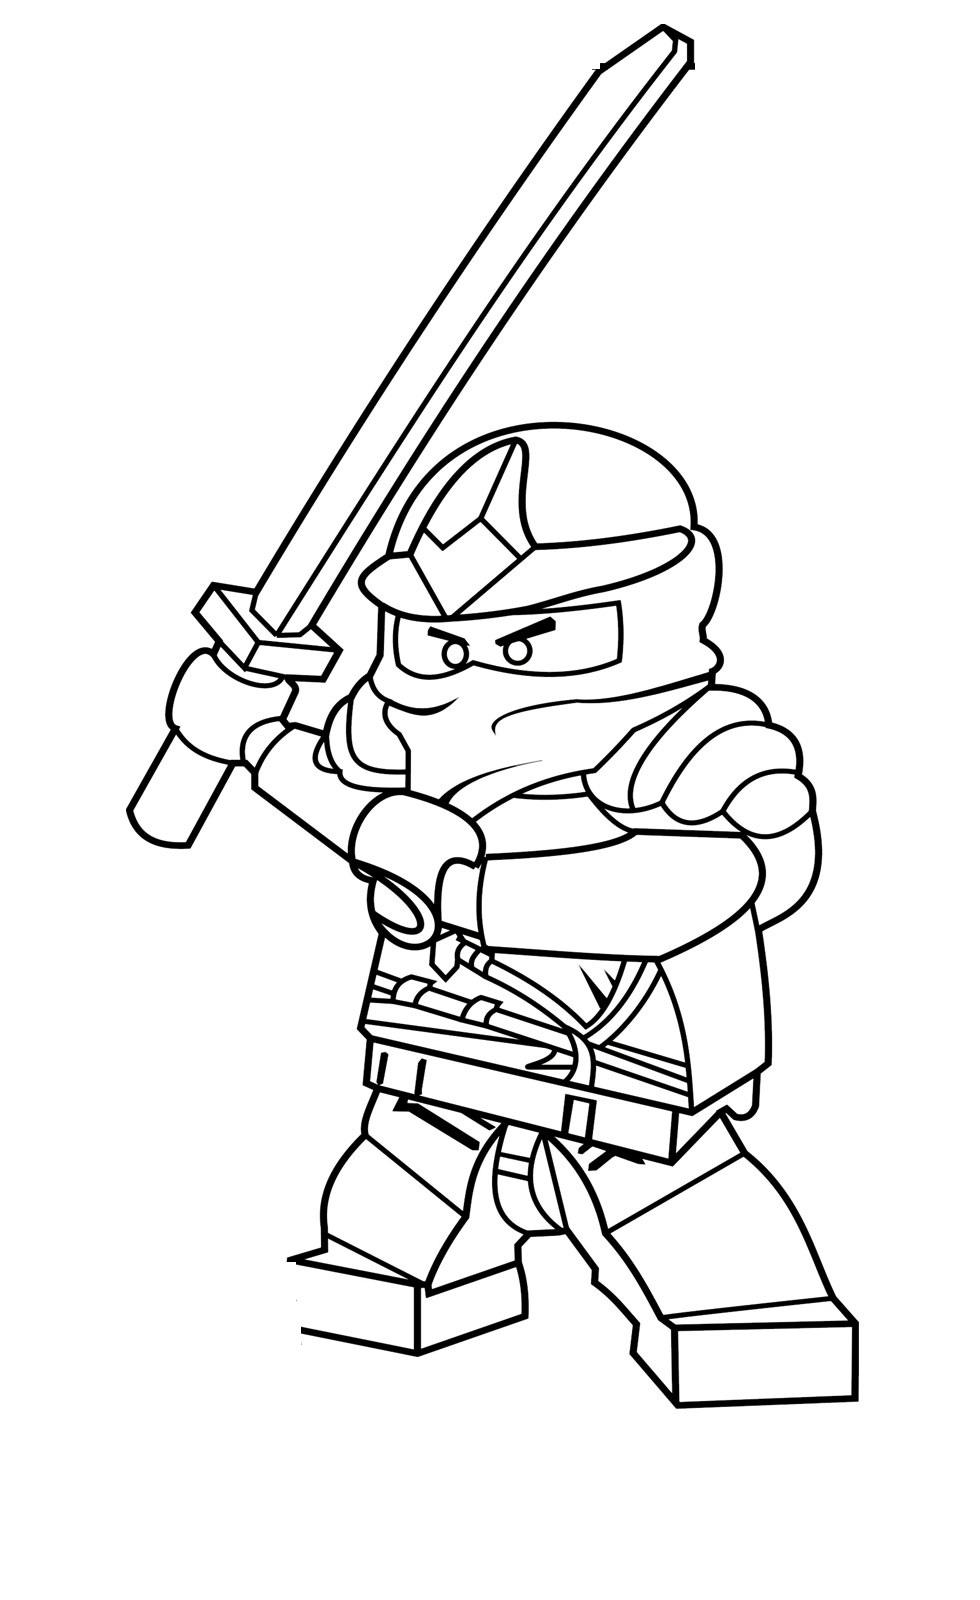 Coloriage ninjago gratuit - dessin a imprimer #22